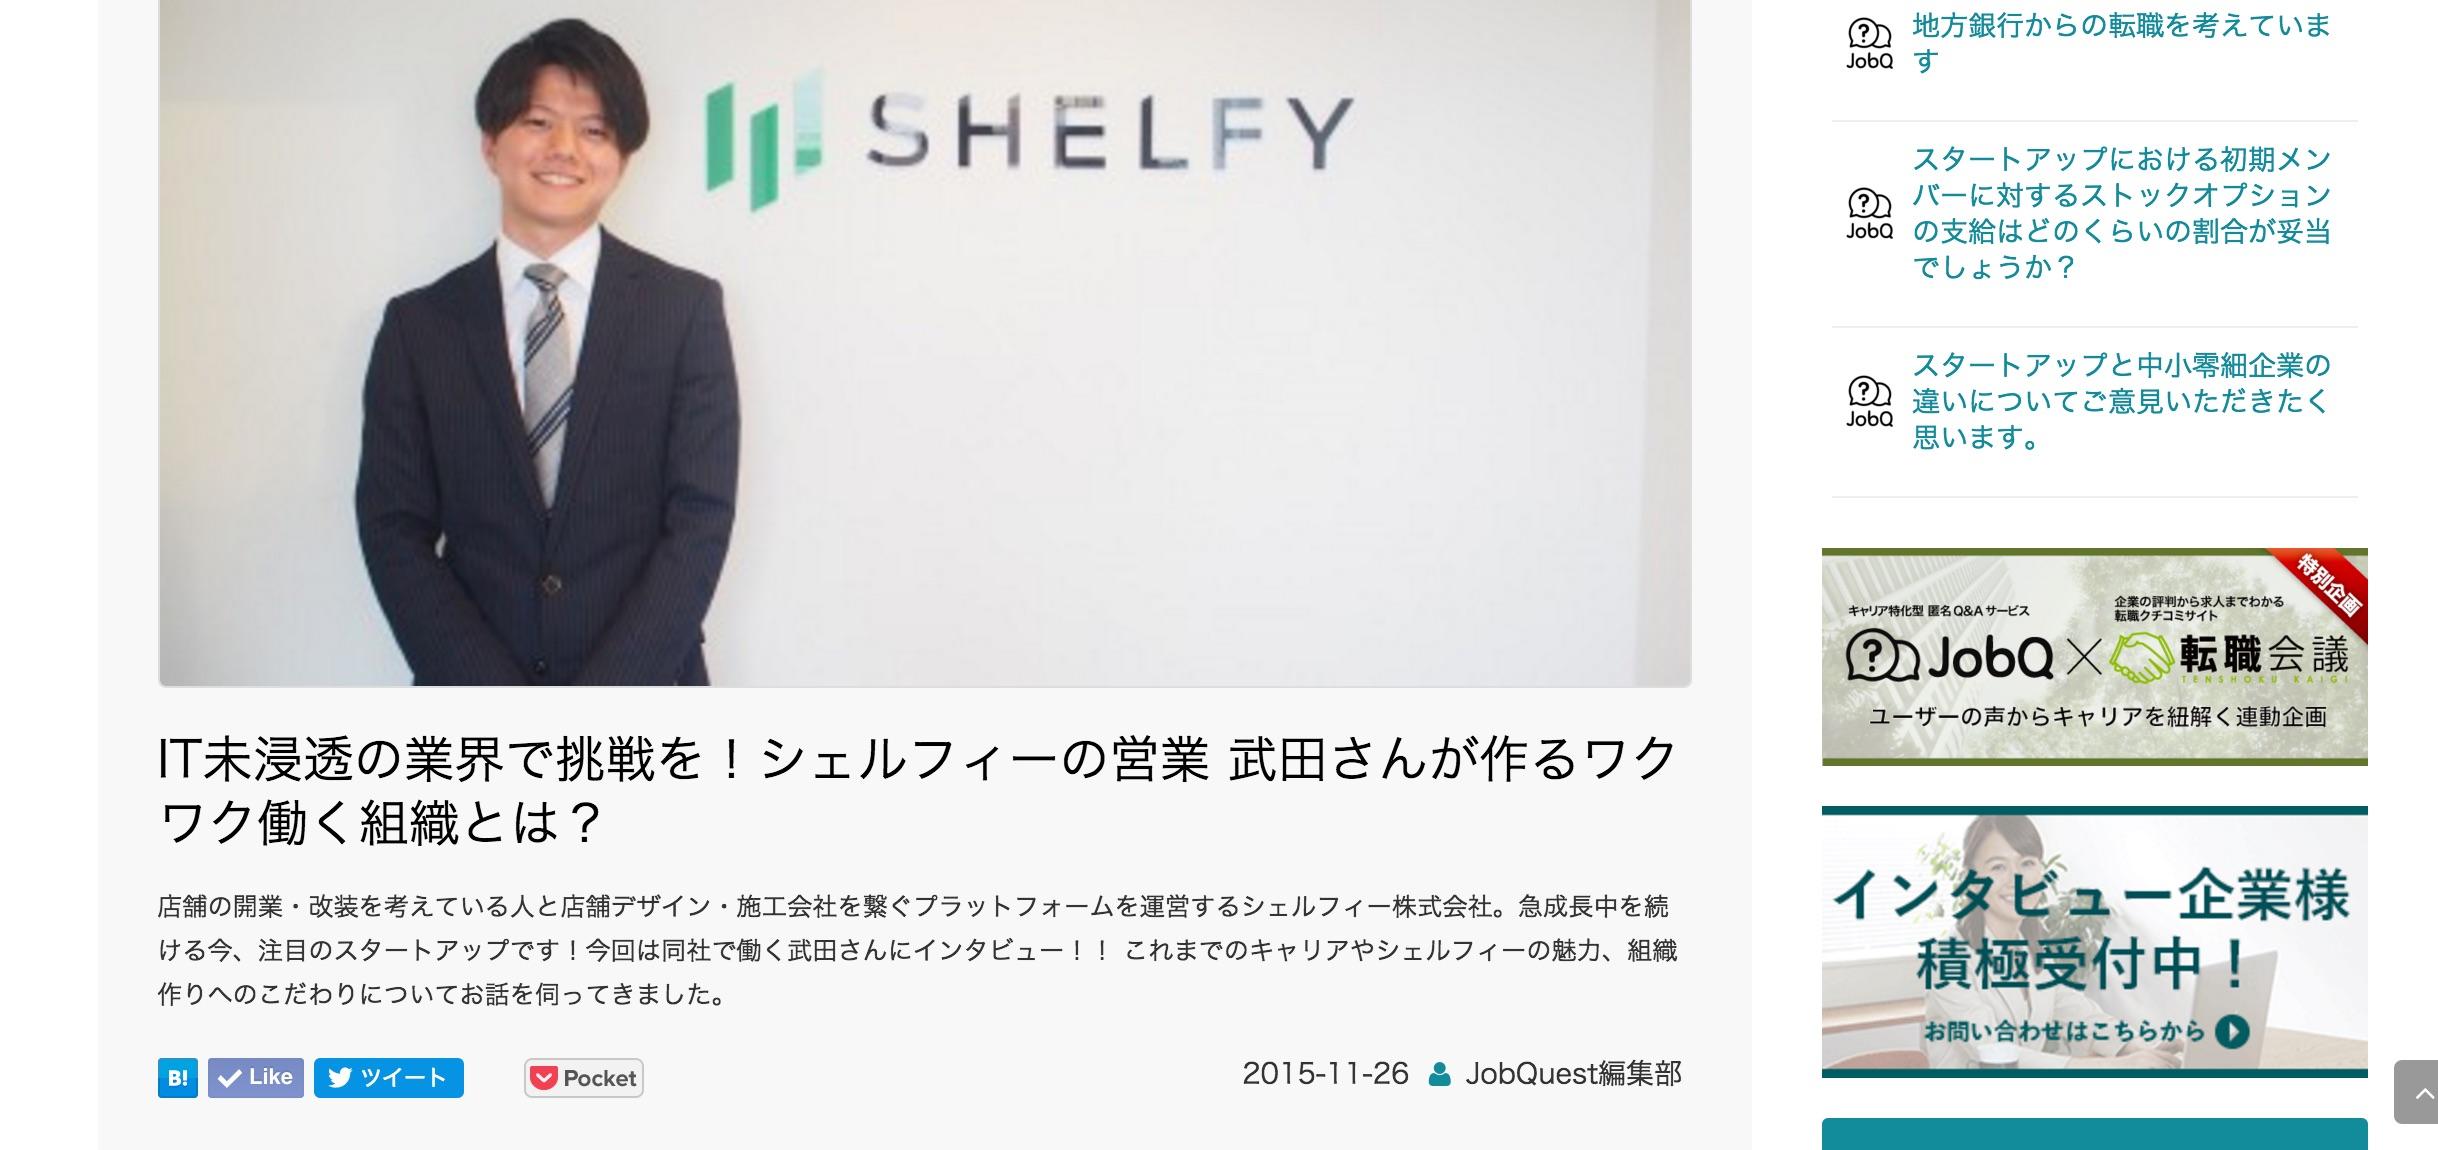 IT未浸透の業界で挑戦を!シェルフィーの営業_武田さんが作るワクワク働く組織とは?